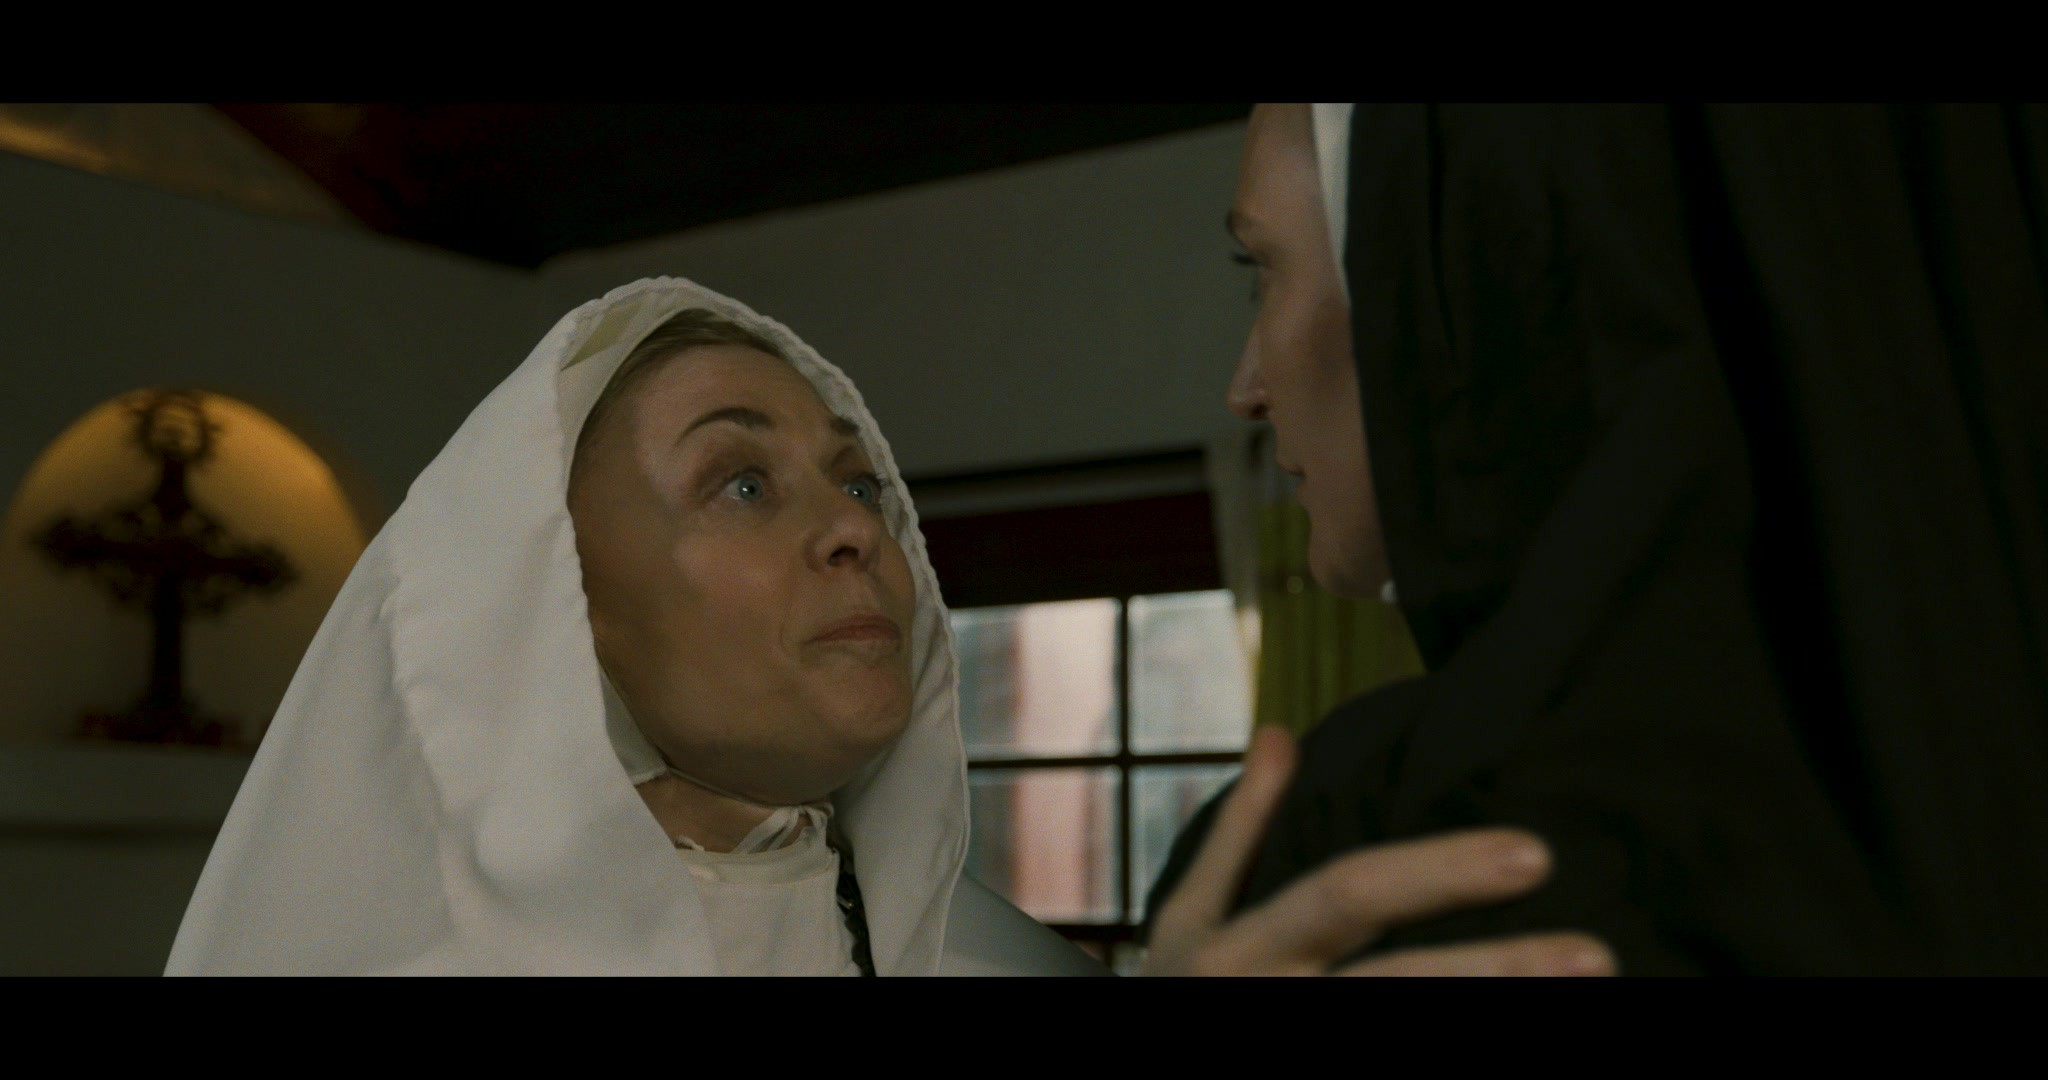 Sex nun video download free, russian girls fucking dvd